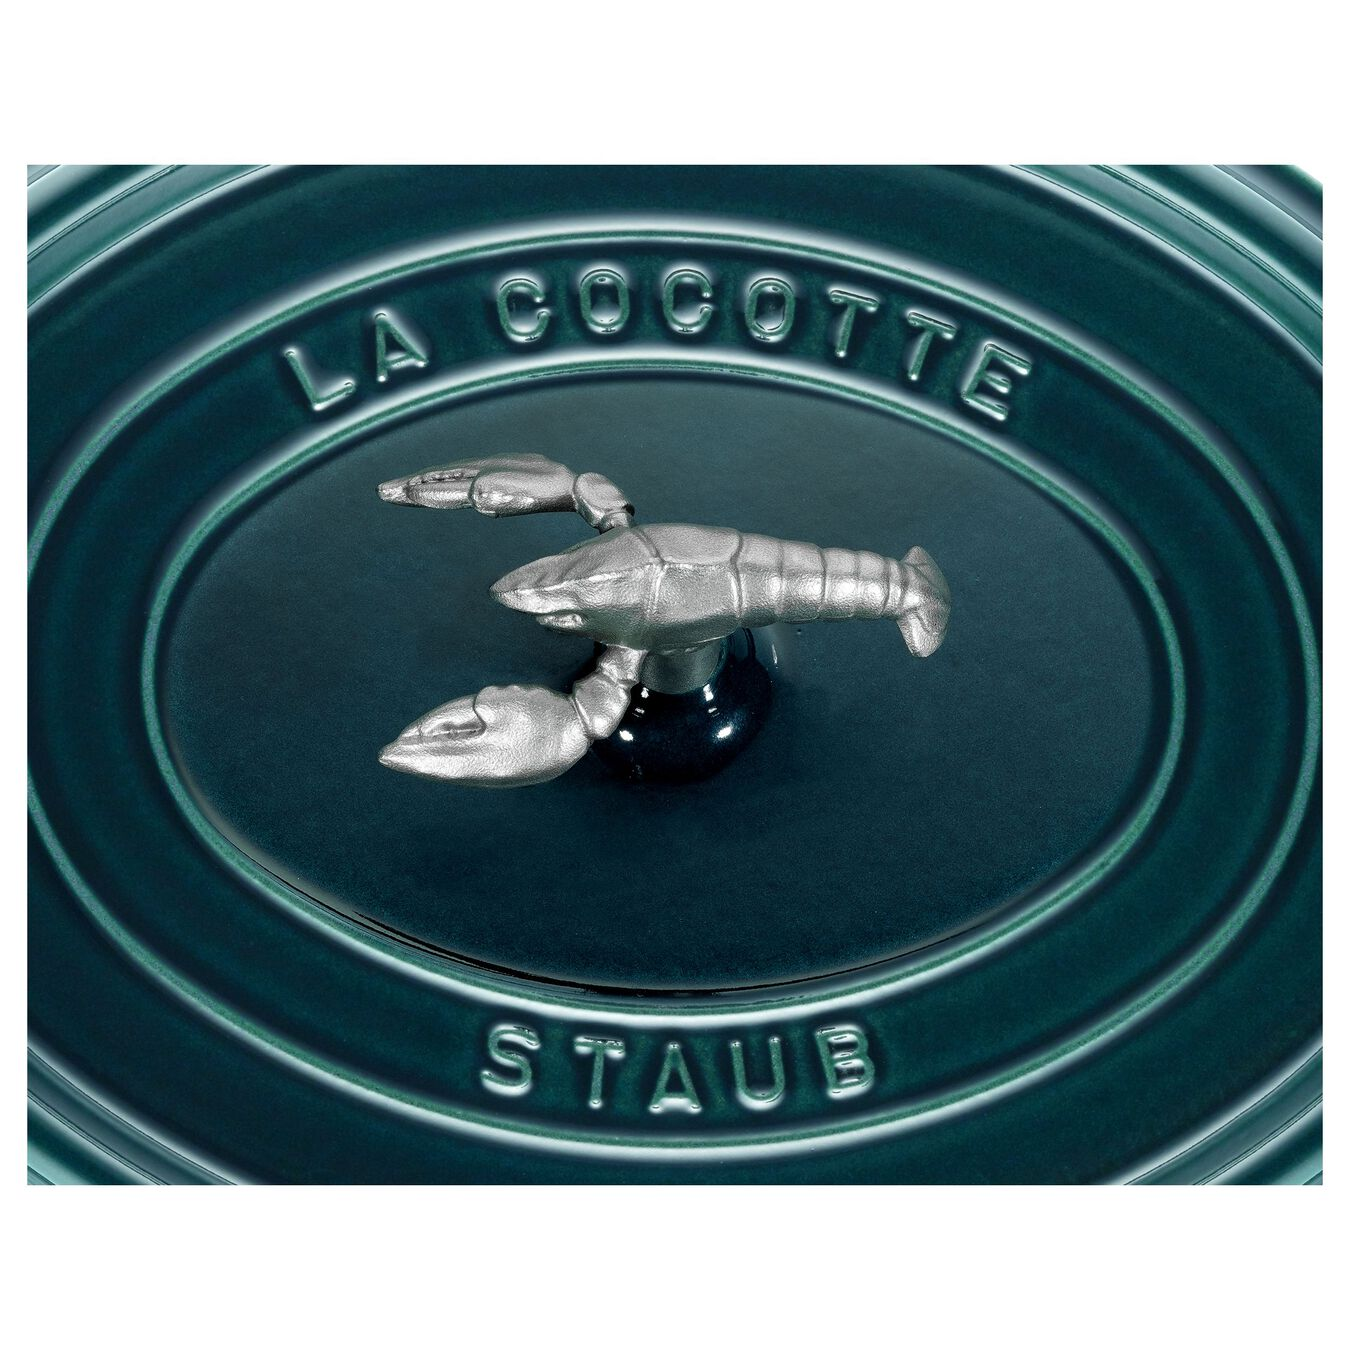 Cocotte bouton homard 31 cm, Ovale, La-Mer, Fonte,,large 7